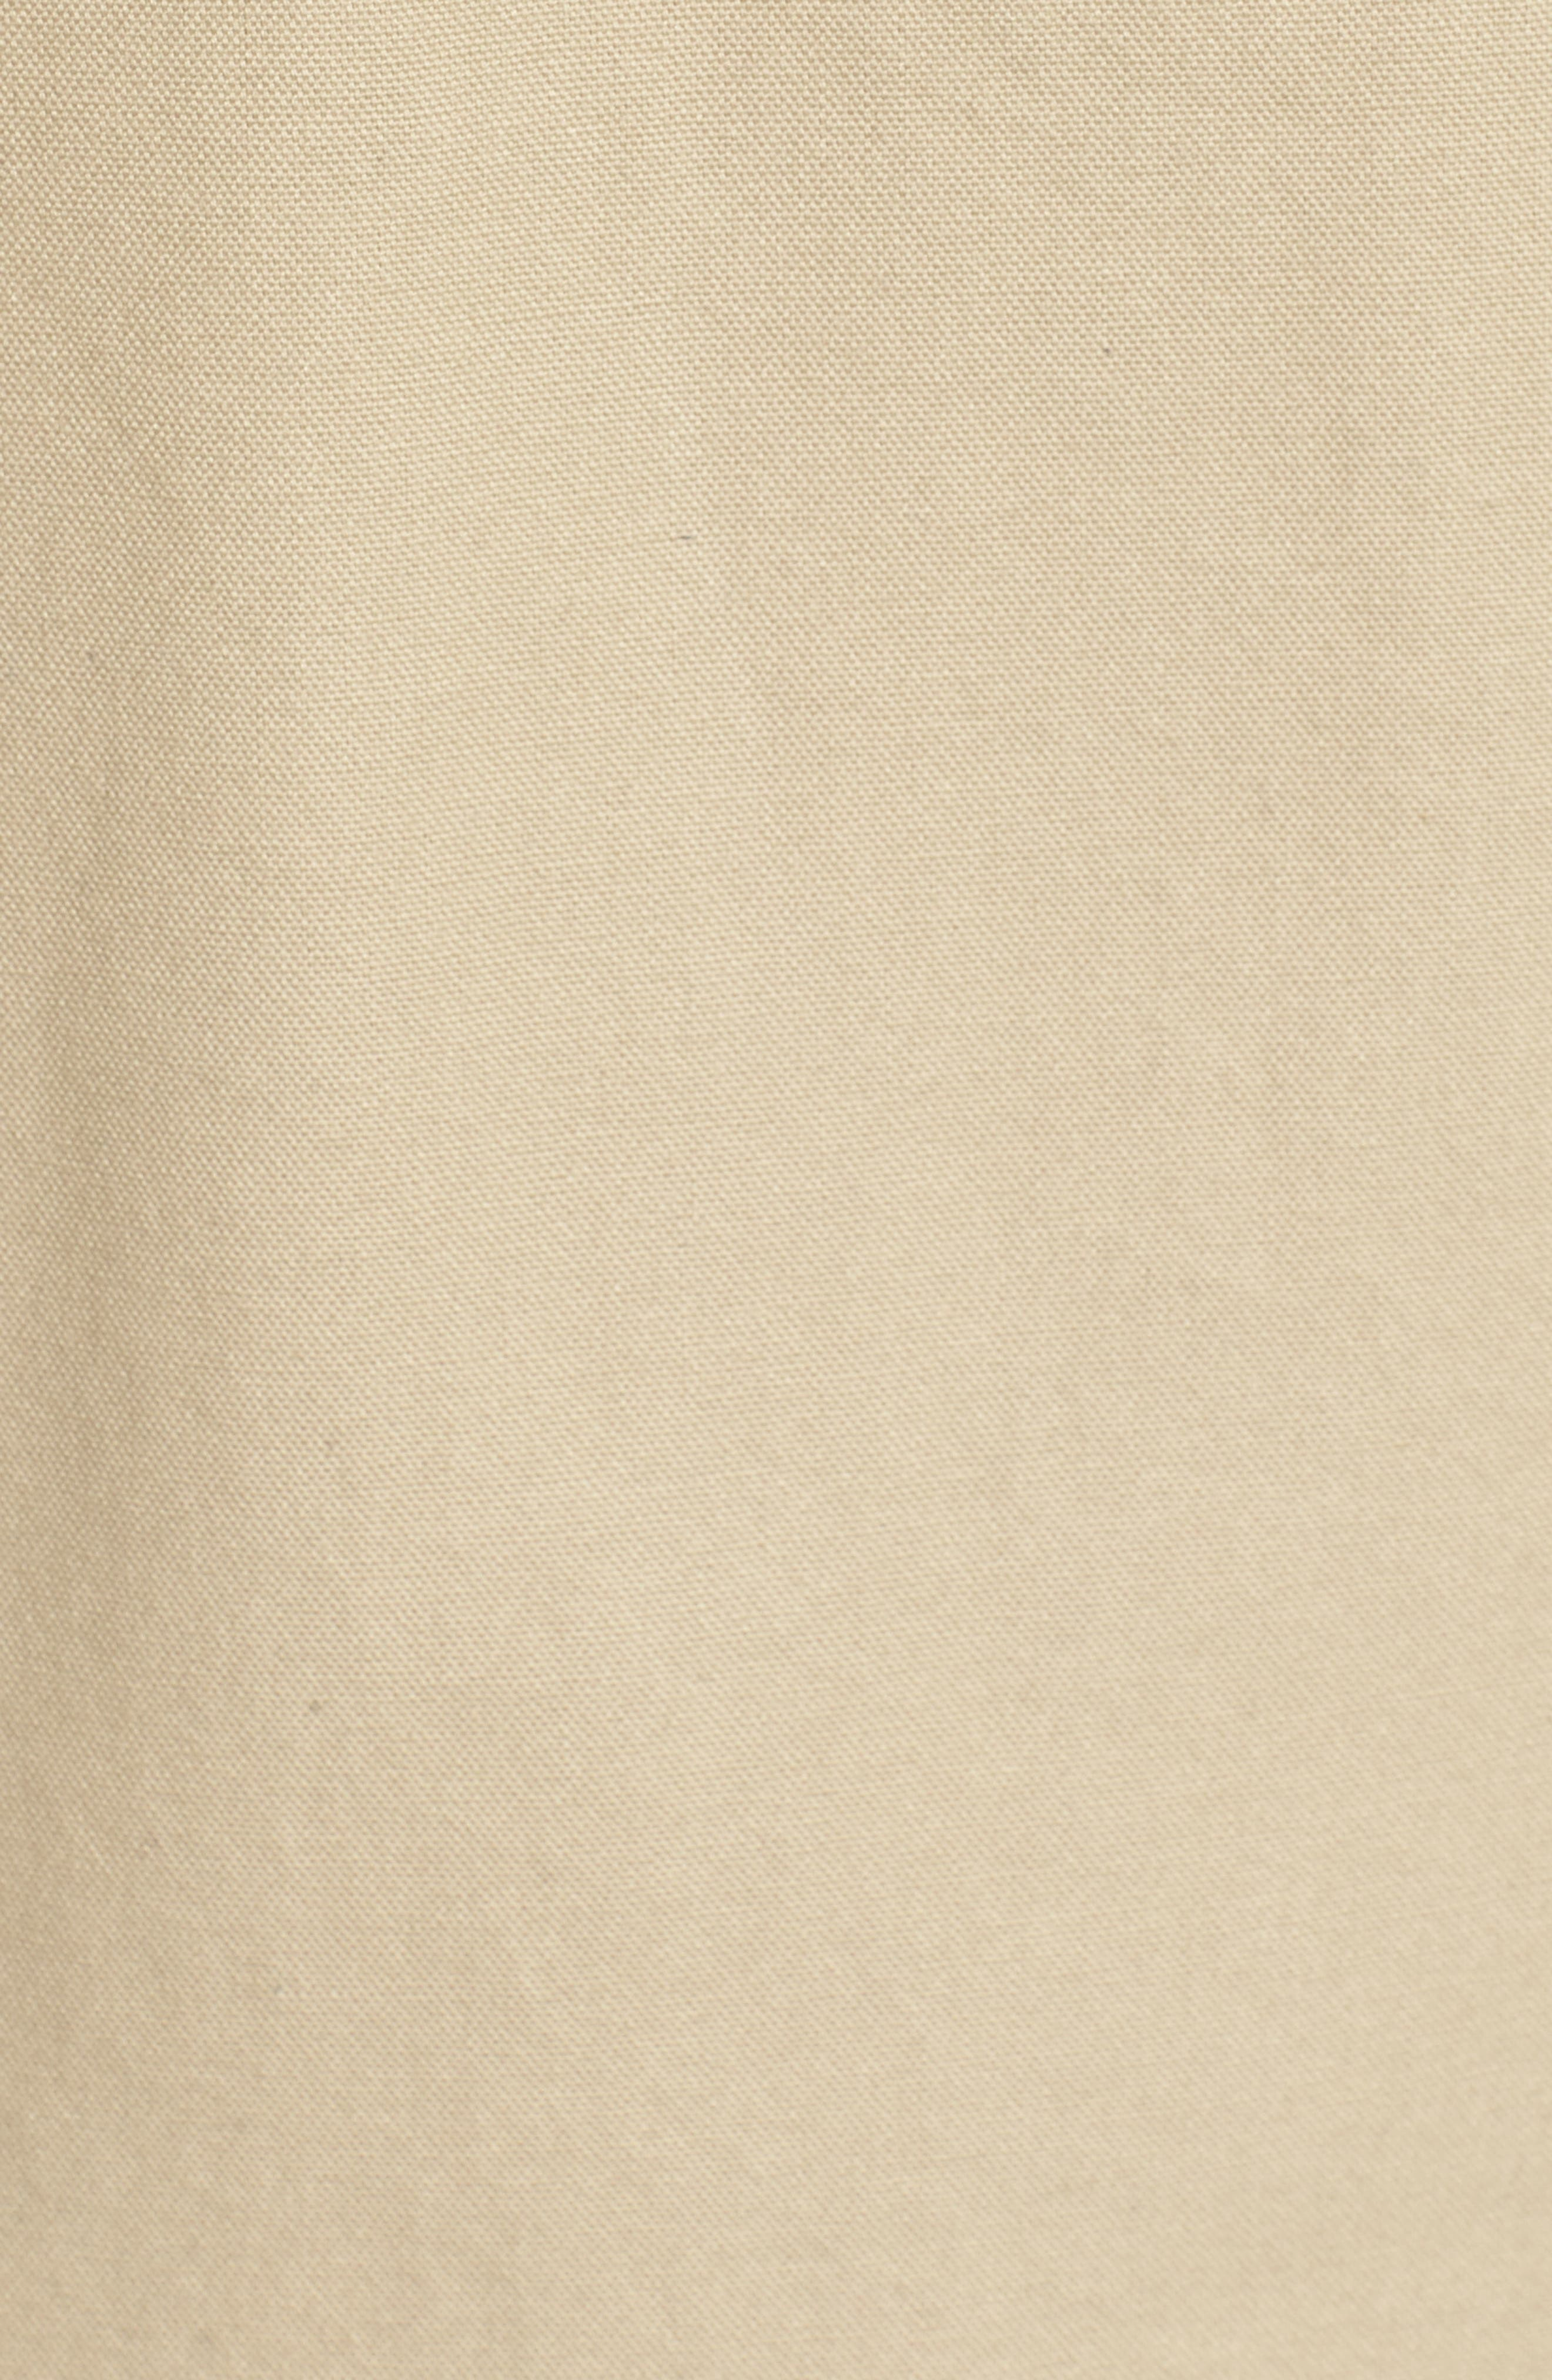 Colton Faux Shearling Trim Hooded Jacket,                             Alternate thumbnail 5, color,                             Khaki